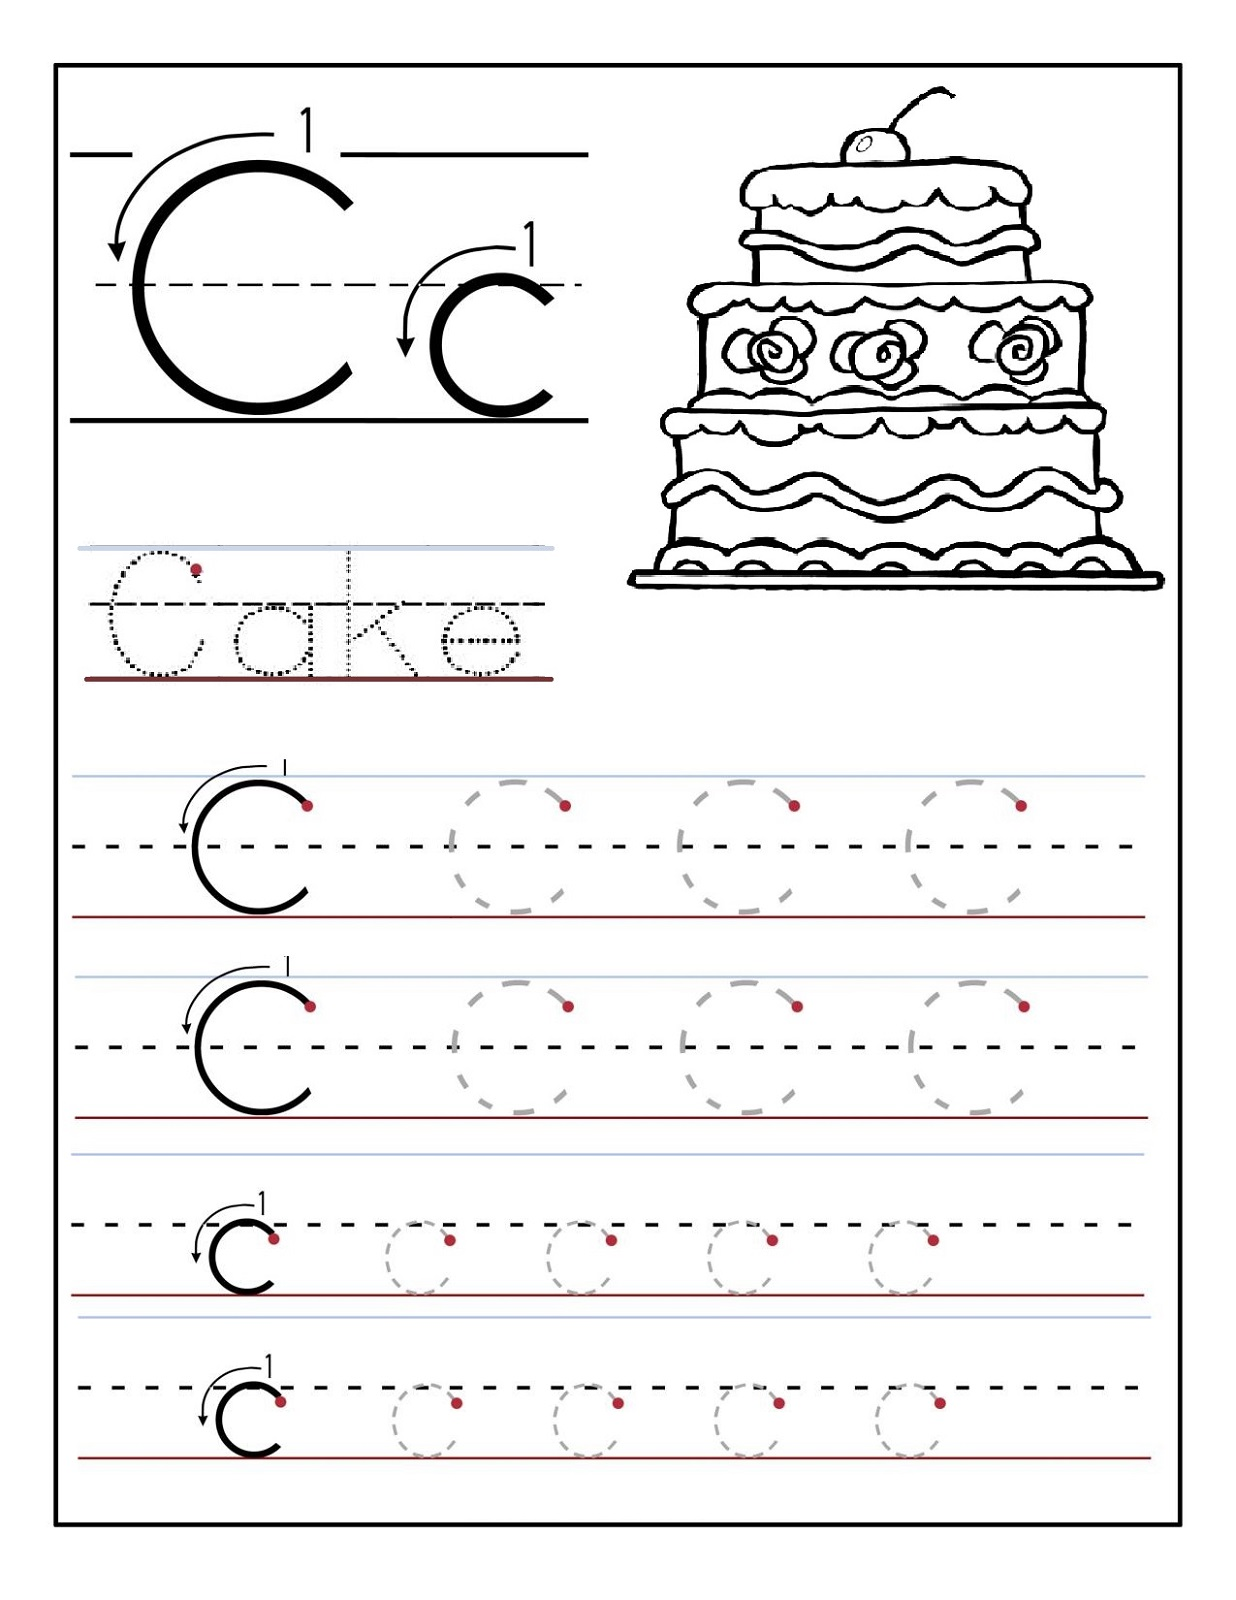 Preschool Alphabet Worksheets | Activity Shelter